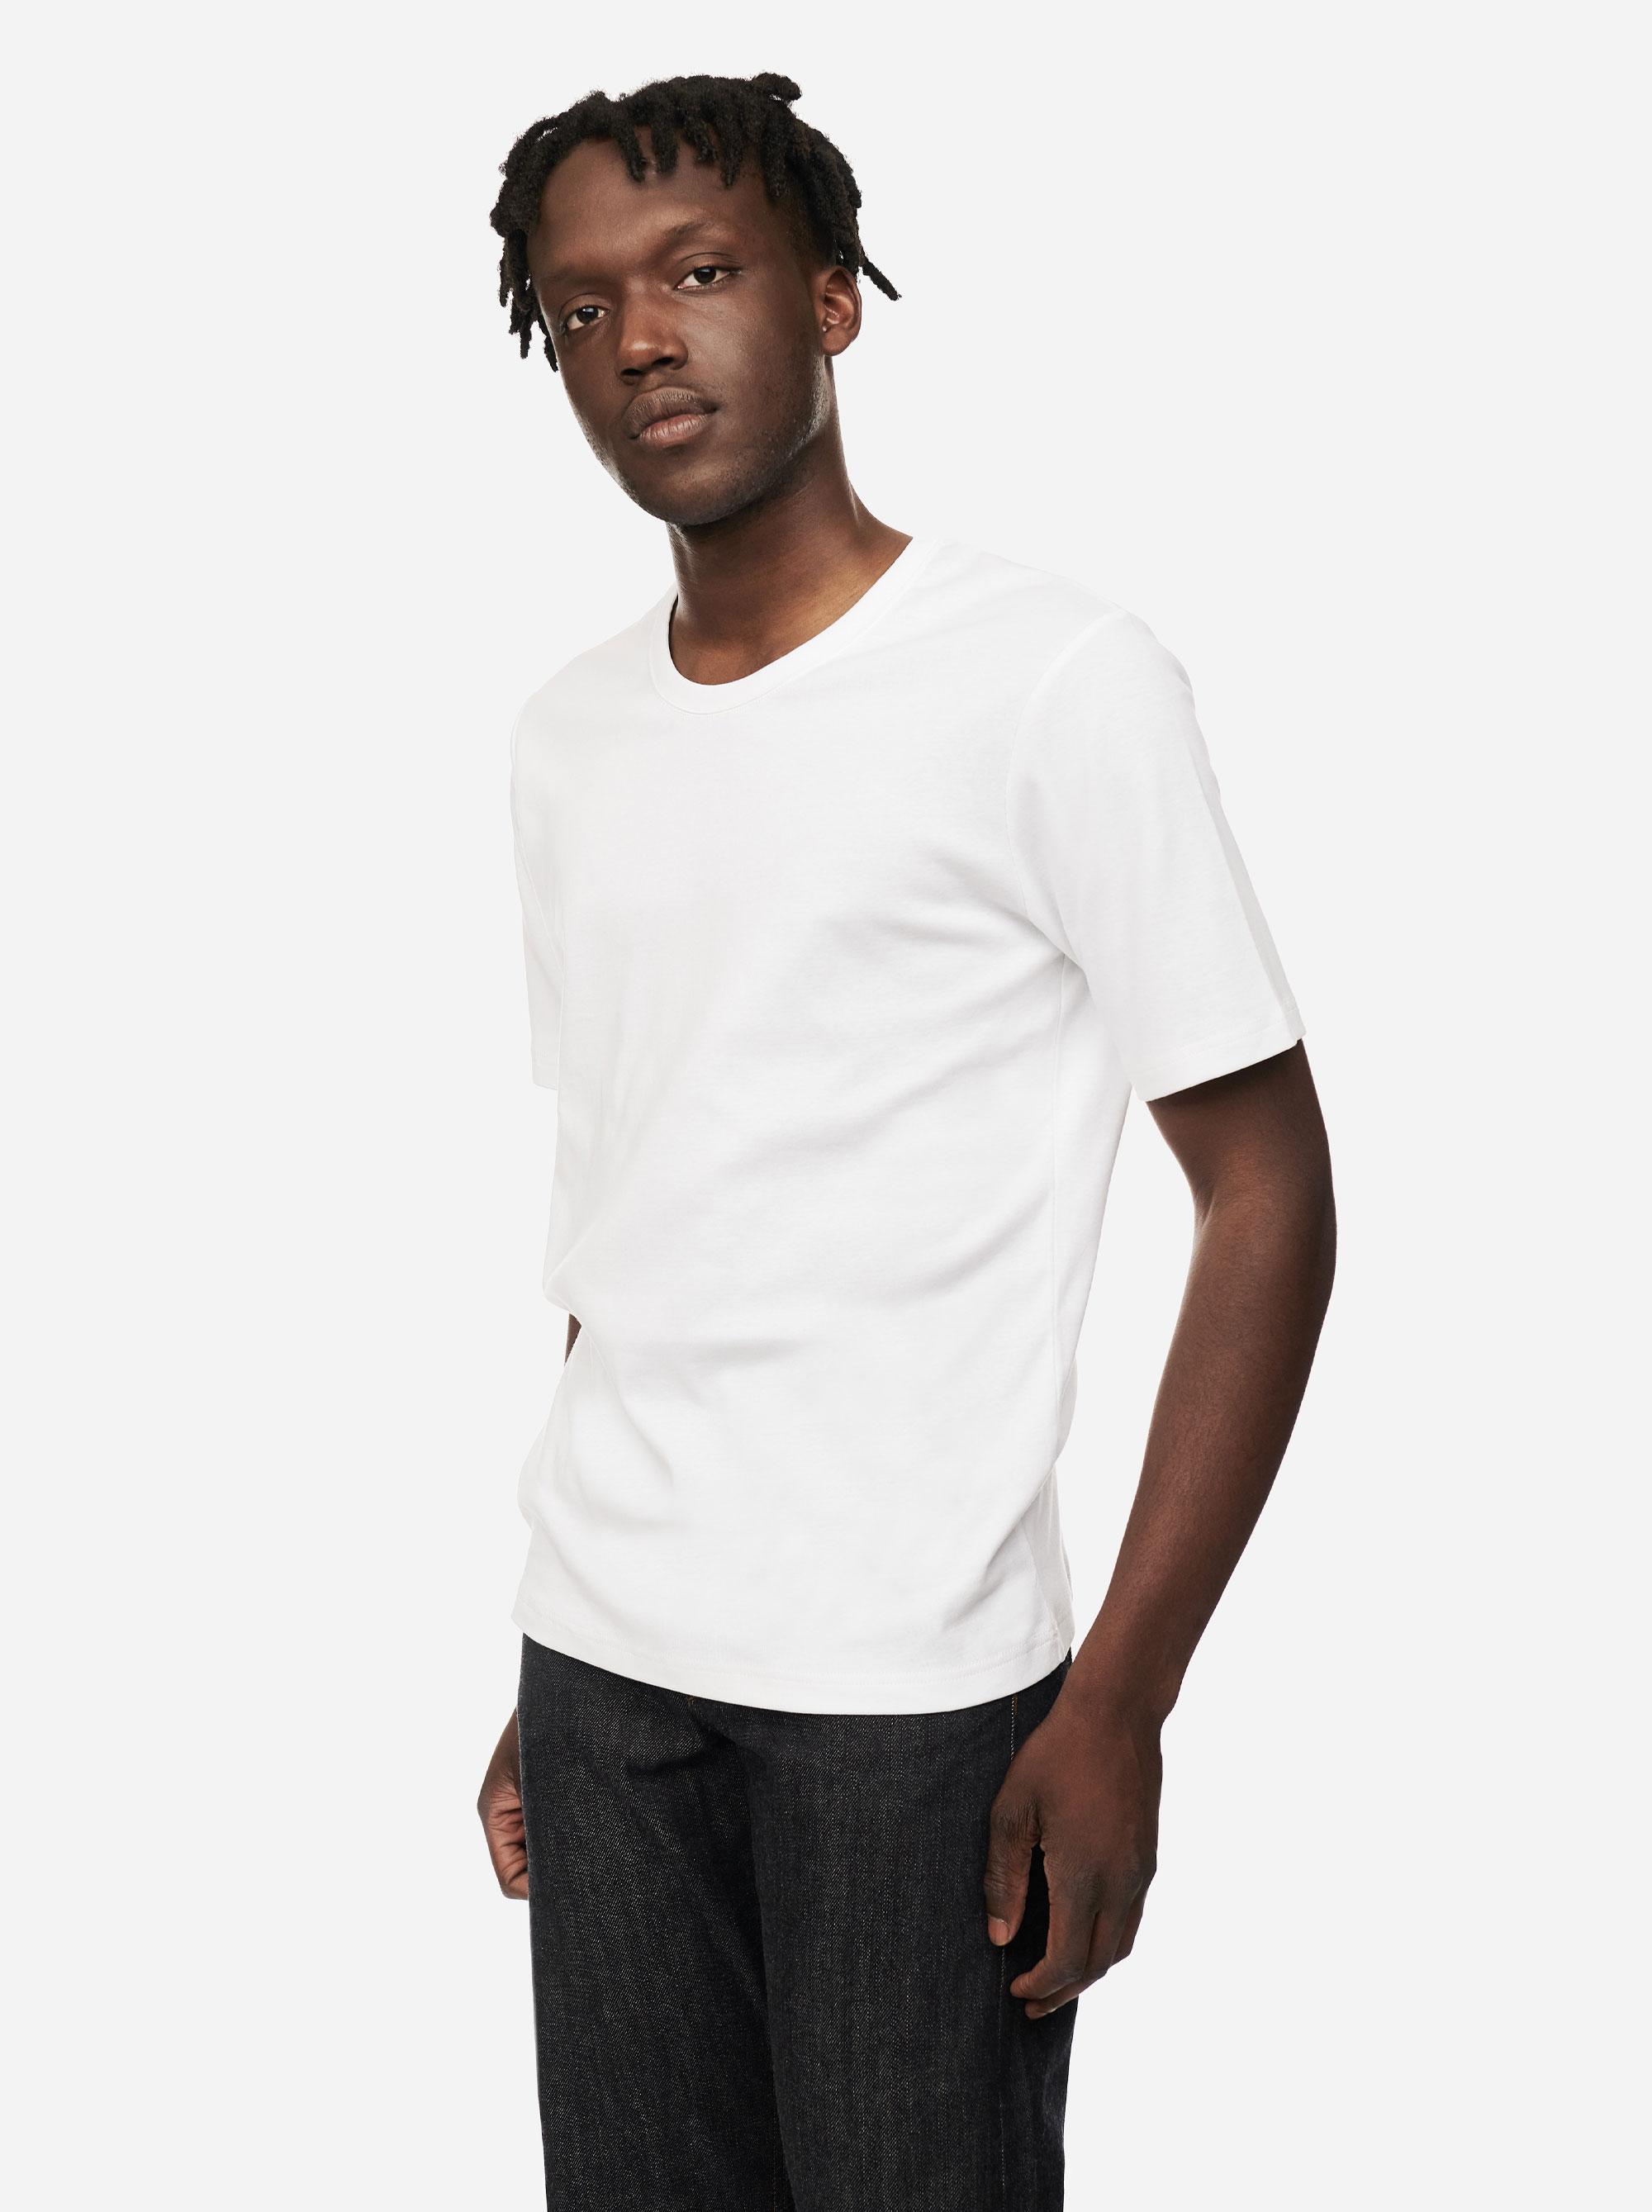 Teym - The T-Shirt - Men - White - 2